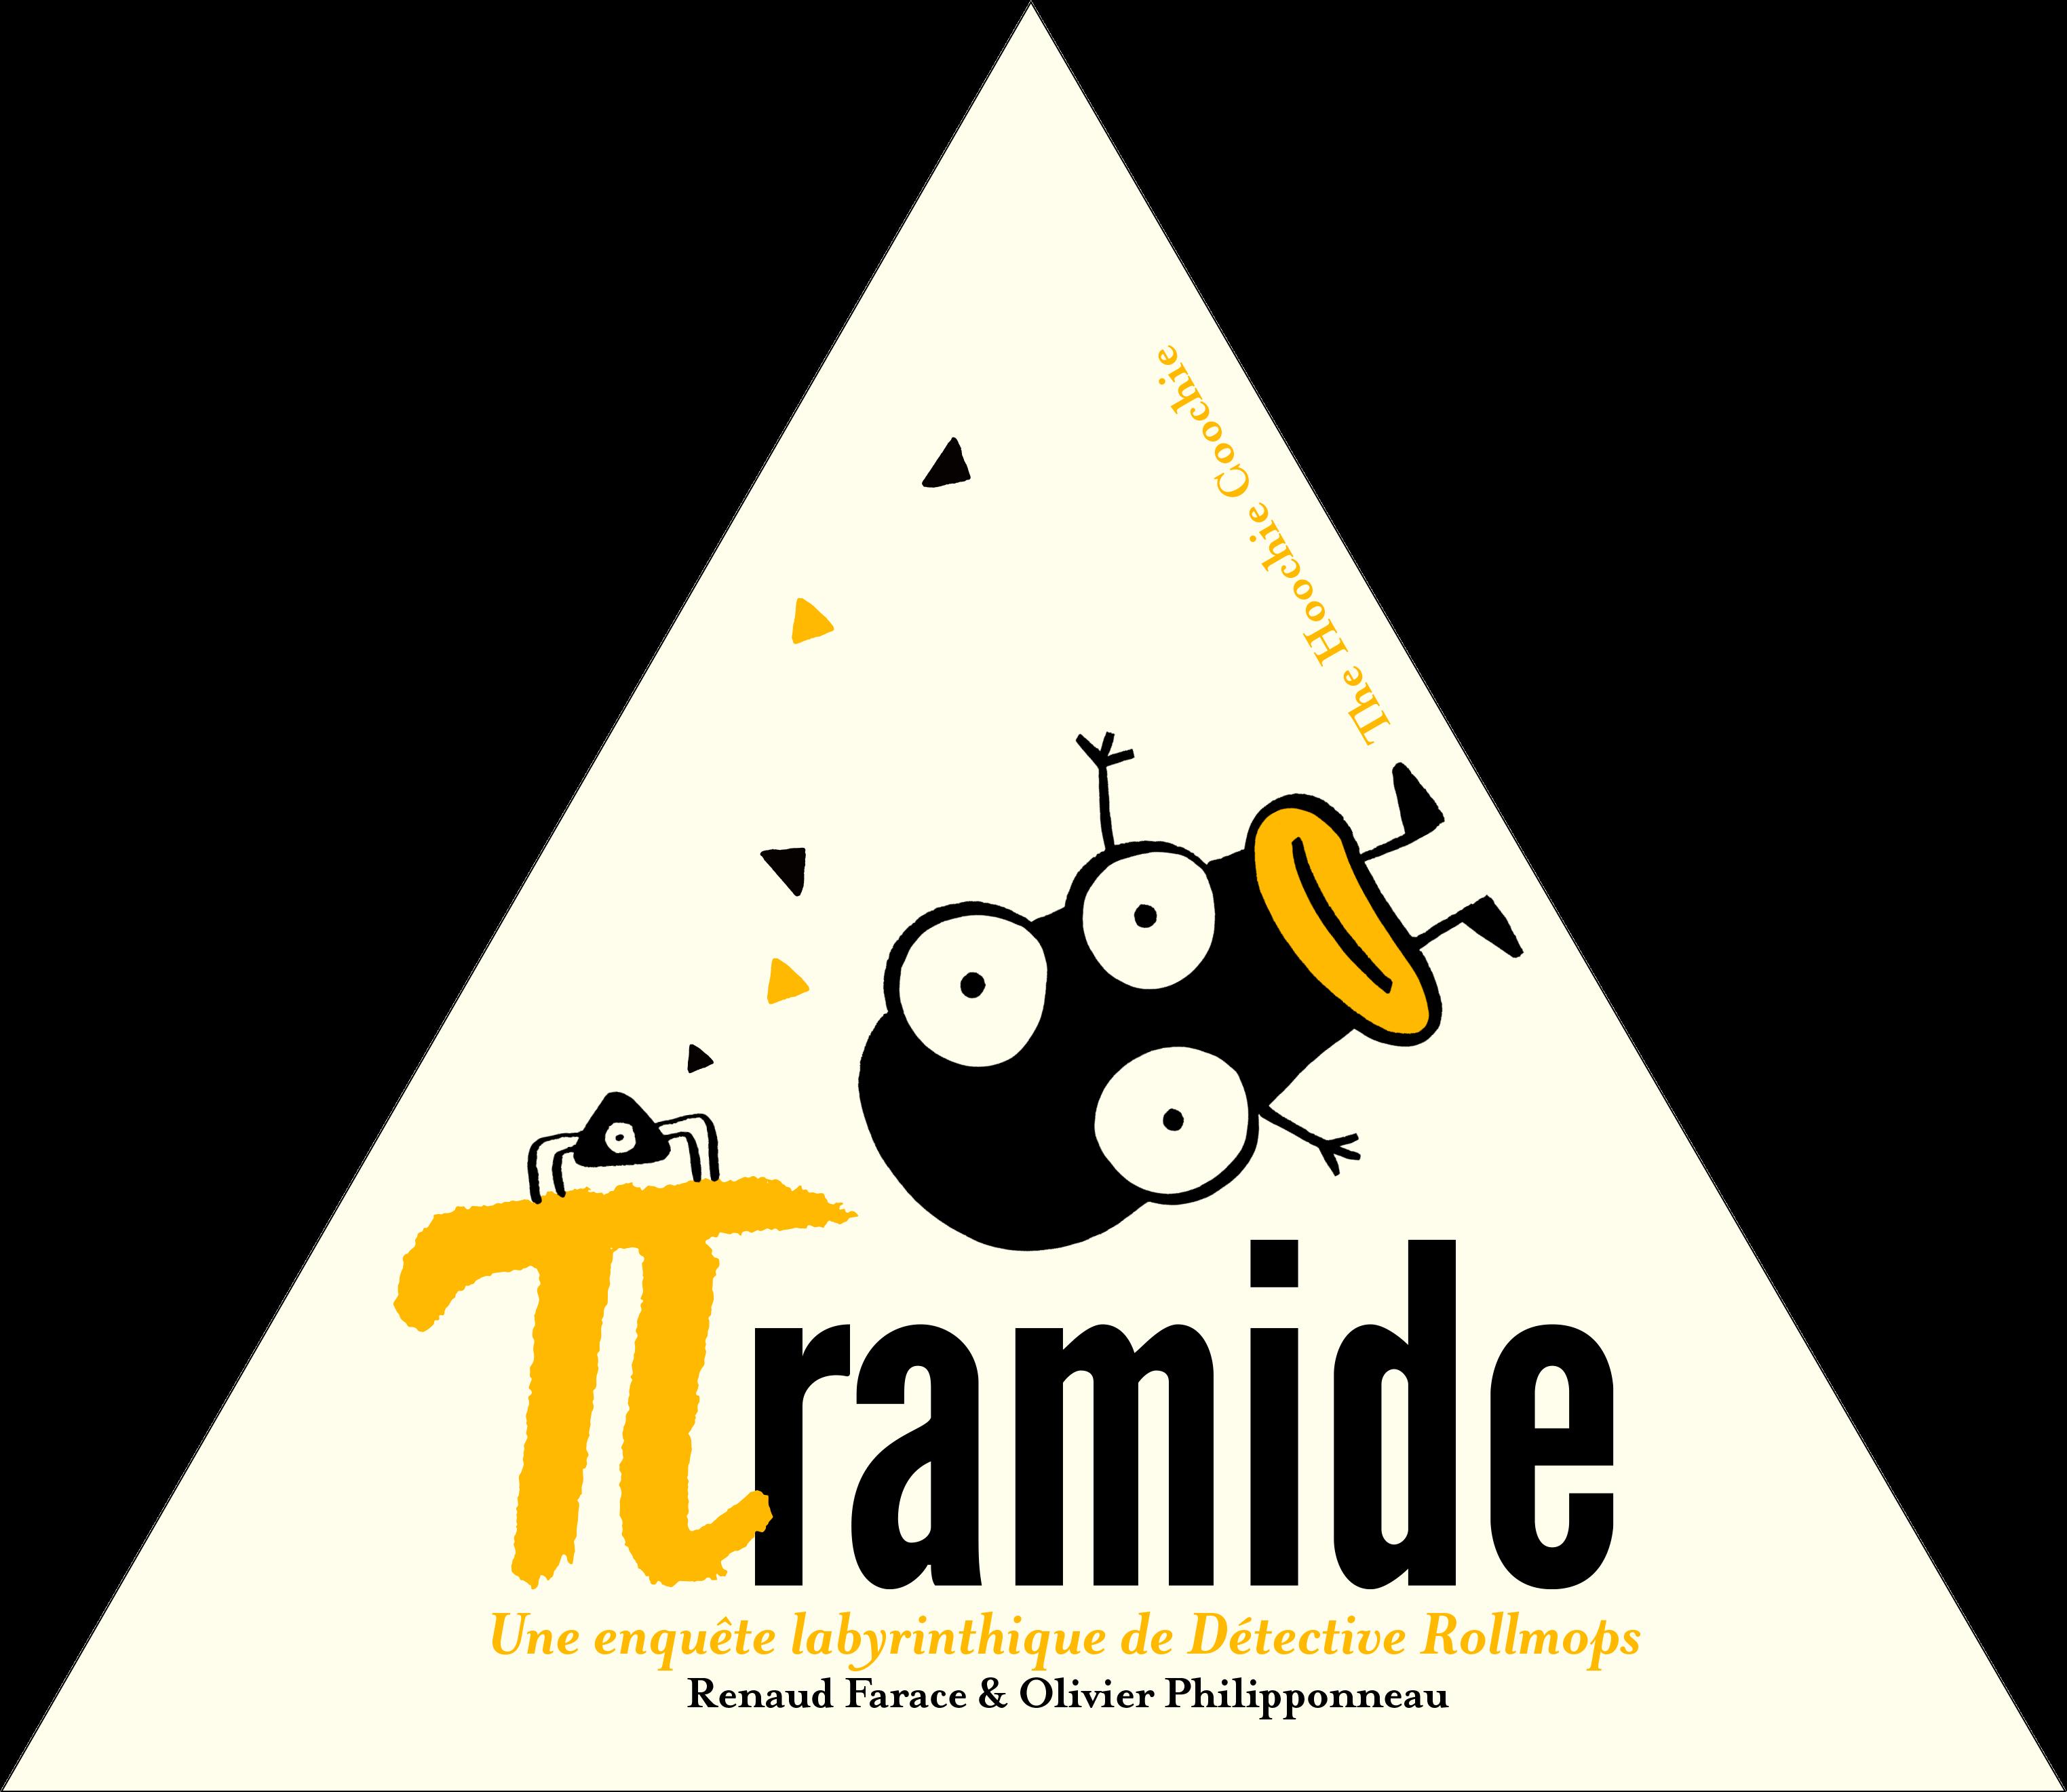 02_couverture_piramide